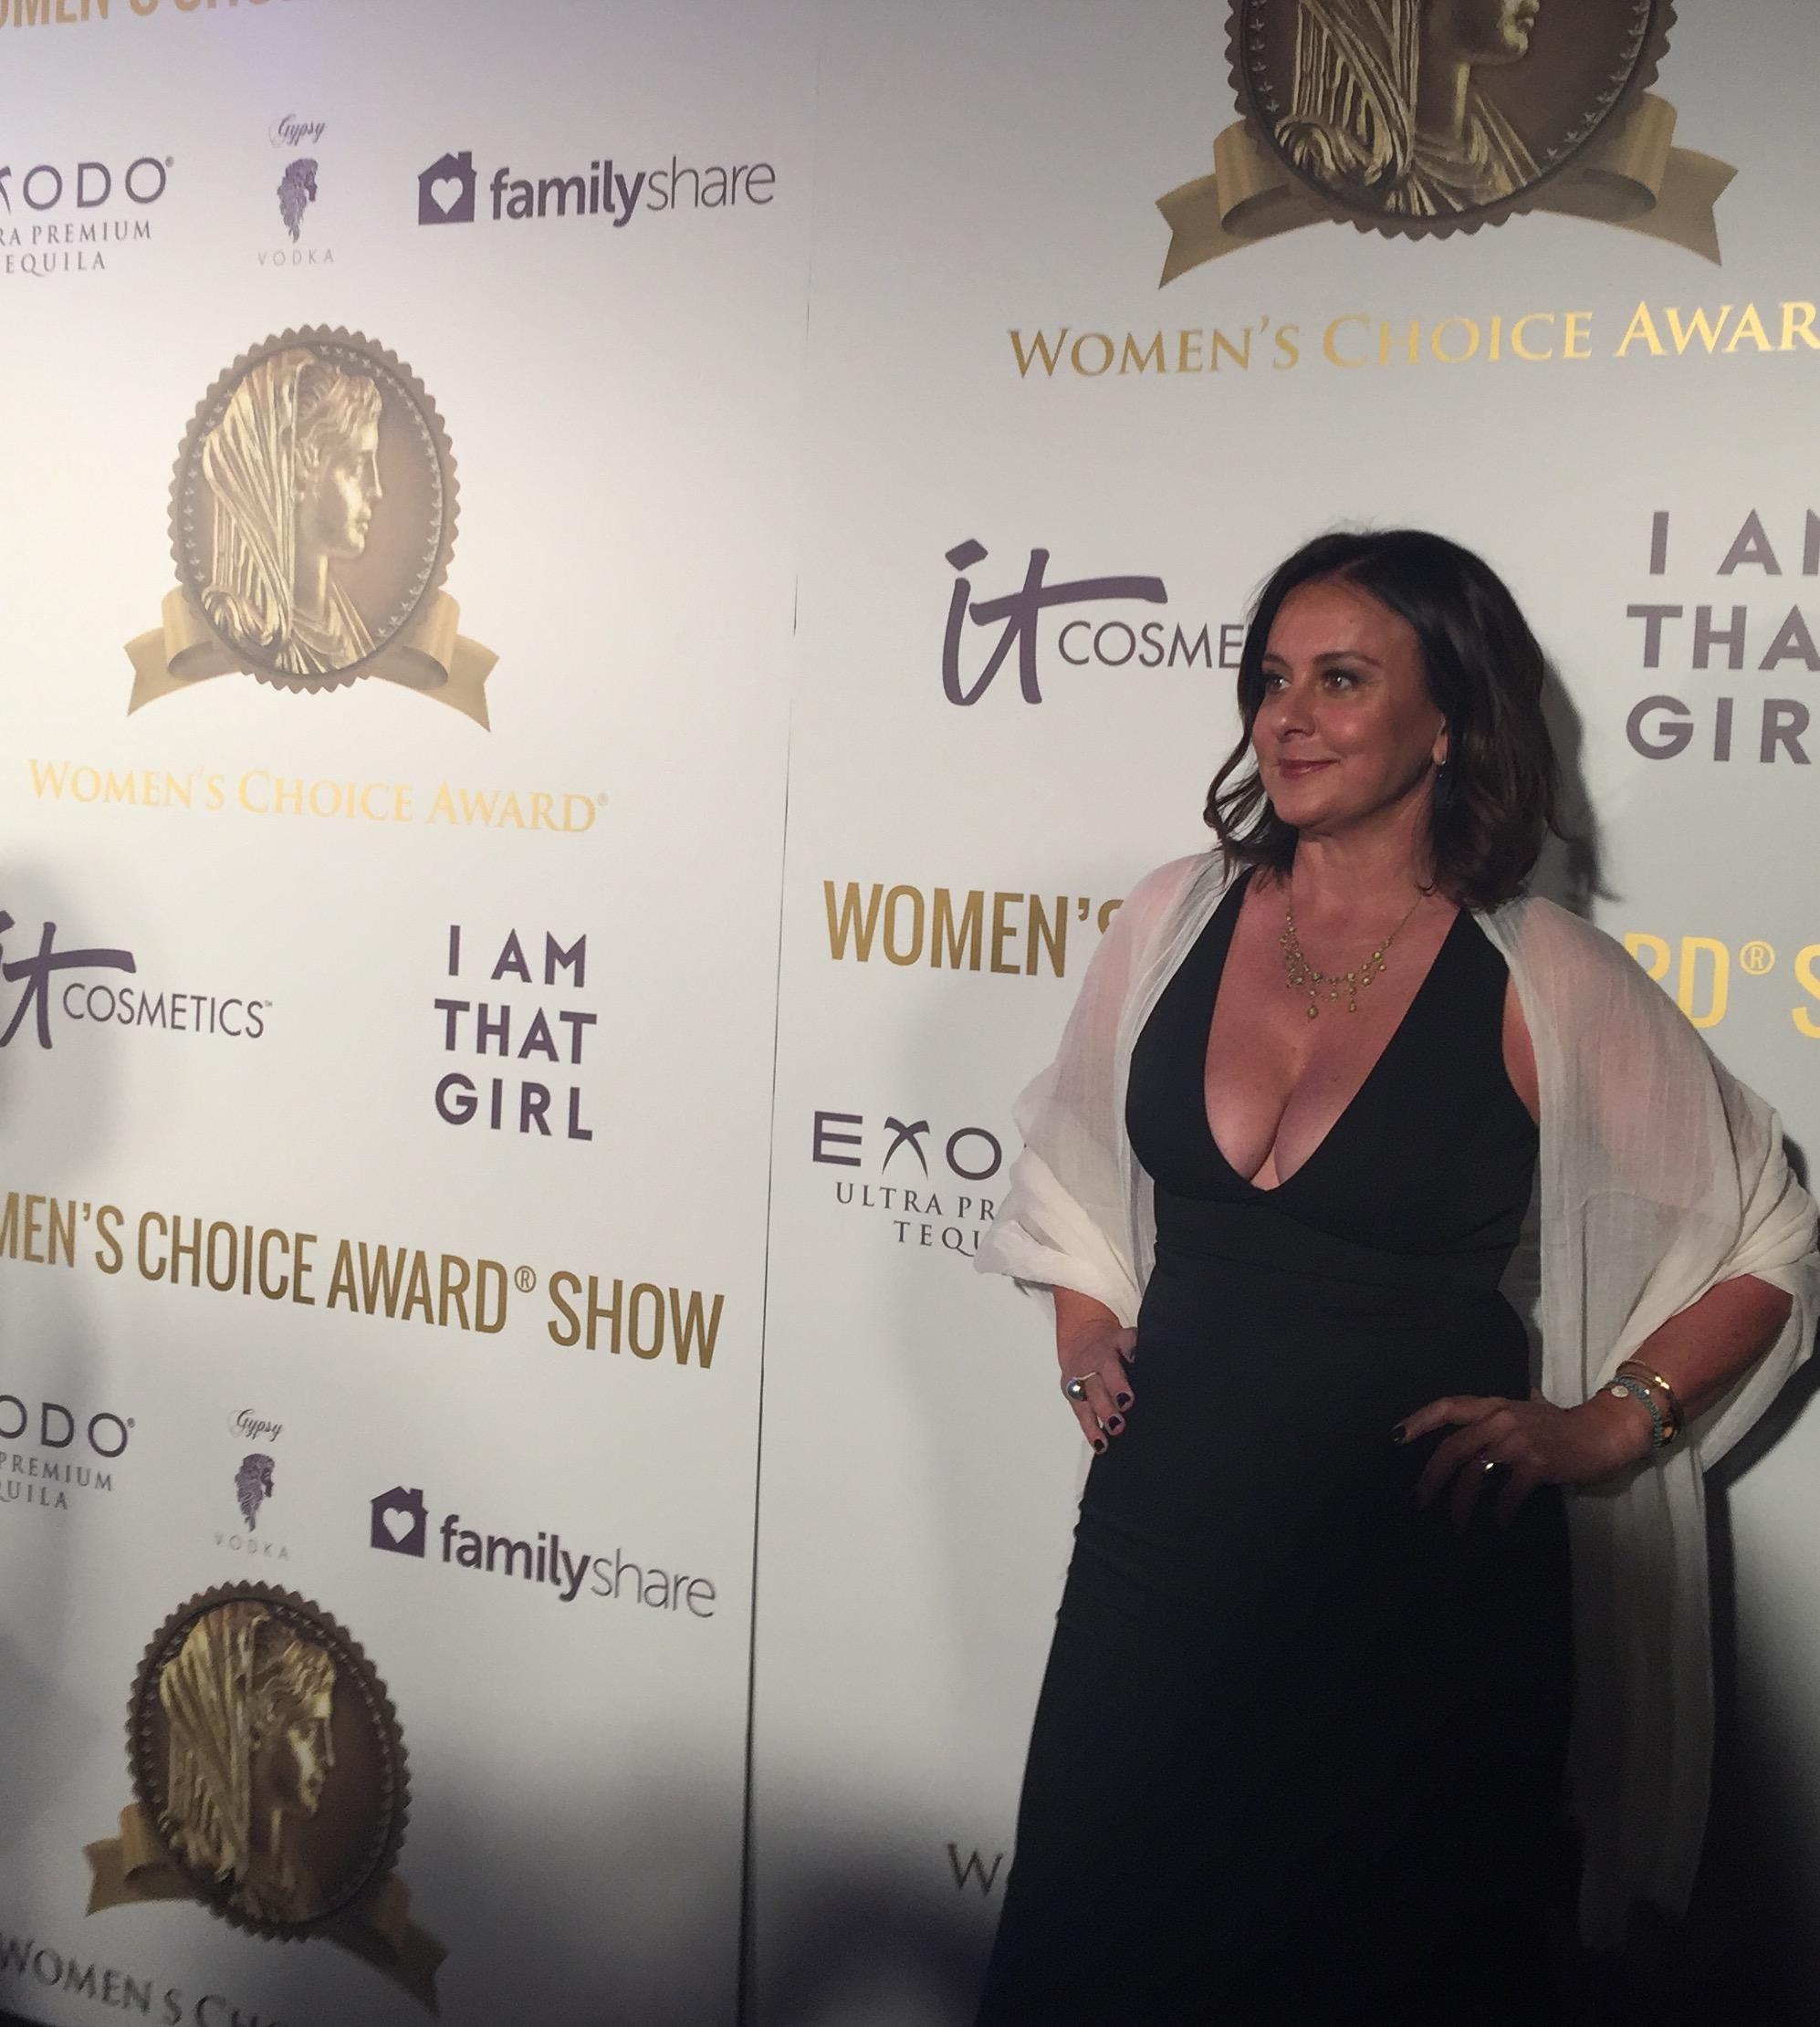 Georgie_shero_womens_choice_awards_red_carpert.jpg